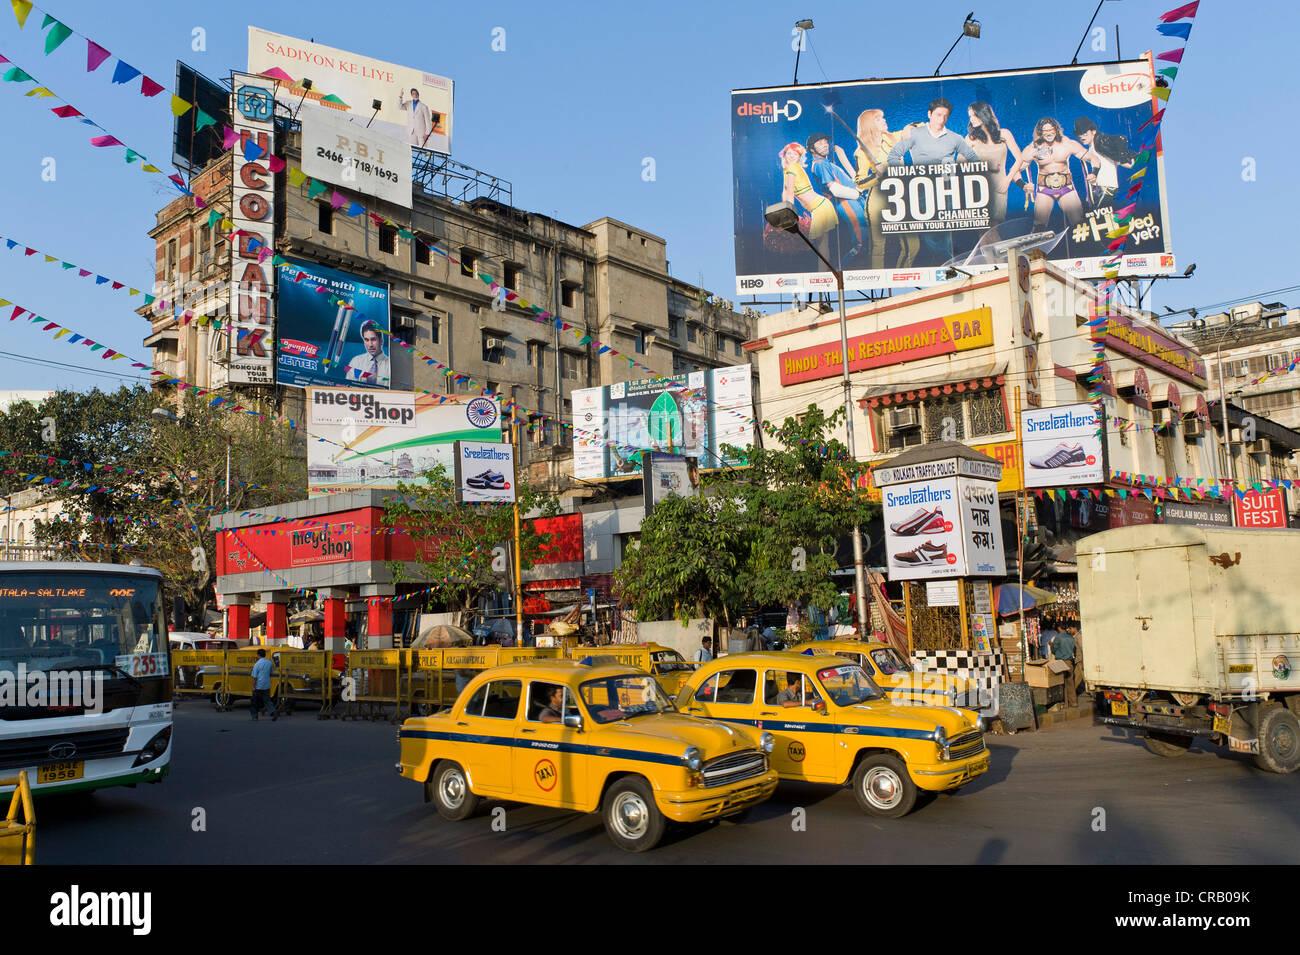 Jawaharlal Nehru Road, Calcutta, Kolkata, West Bengal, India - Stock Image